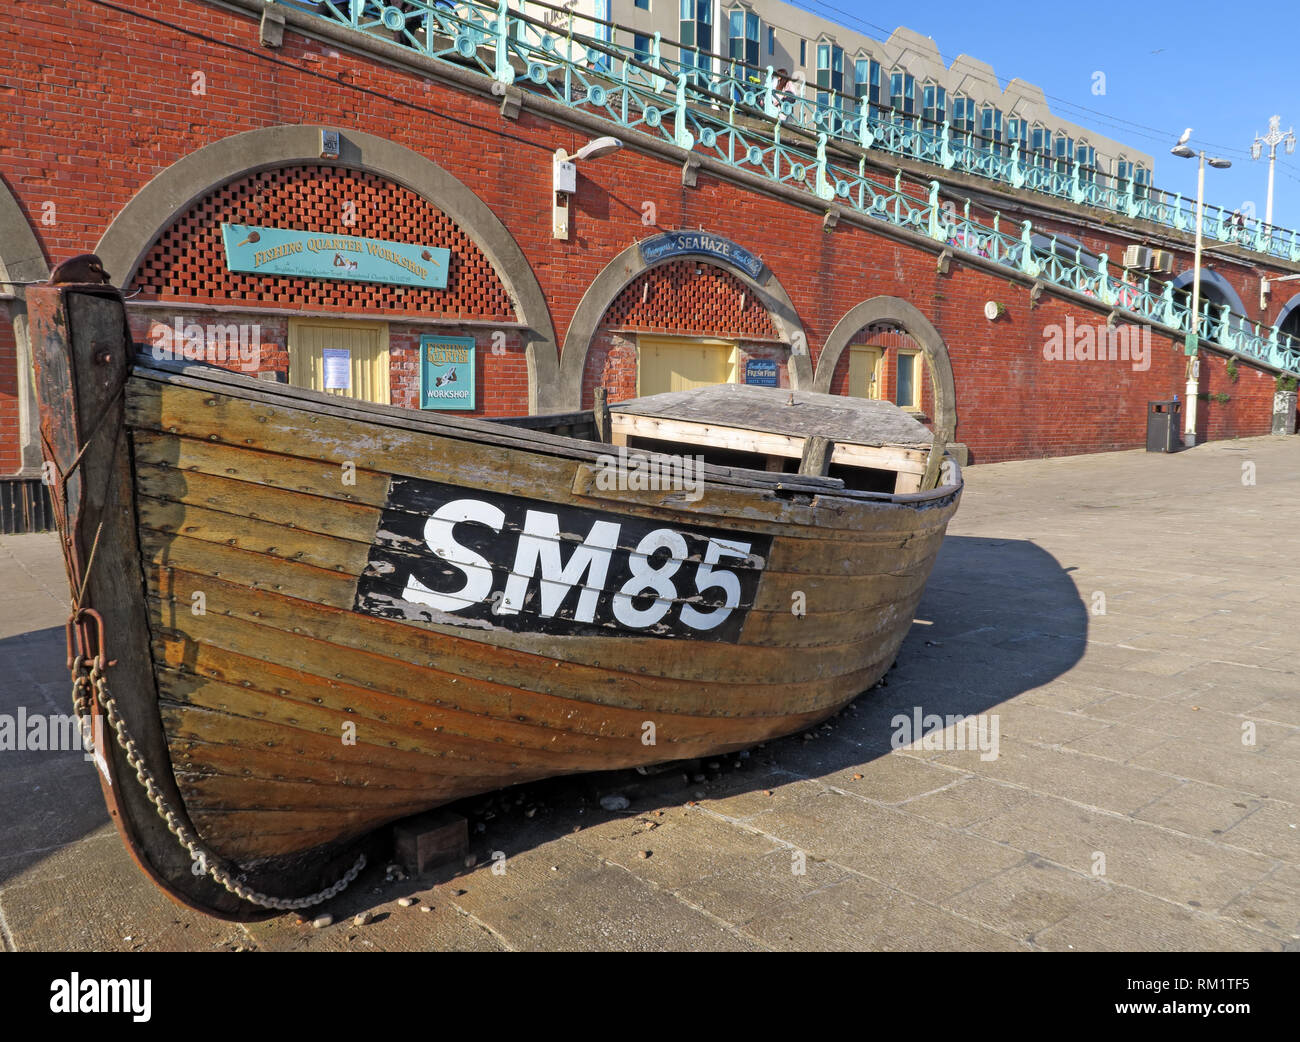 Laden Sie dieses Alamy Stockfoto SM 85 Fischerboot, Brighton Strand, Kings Road Arches - RM1TF5